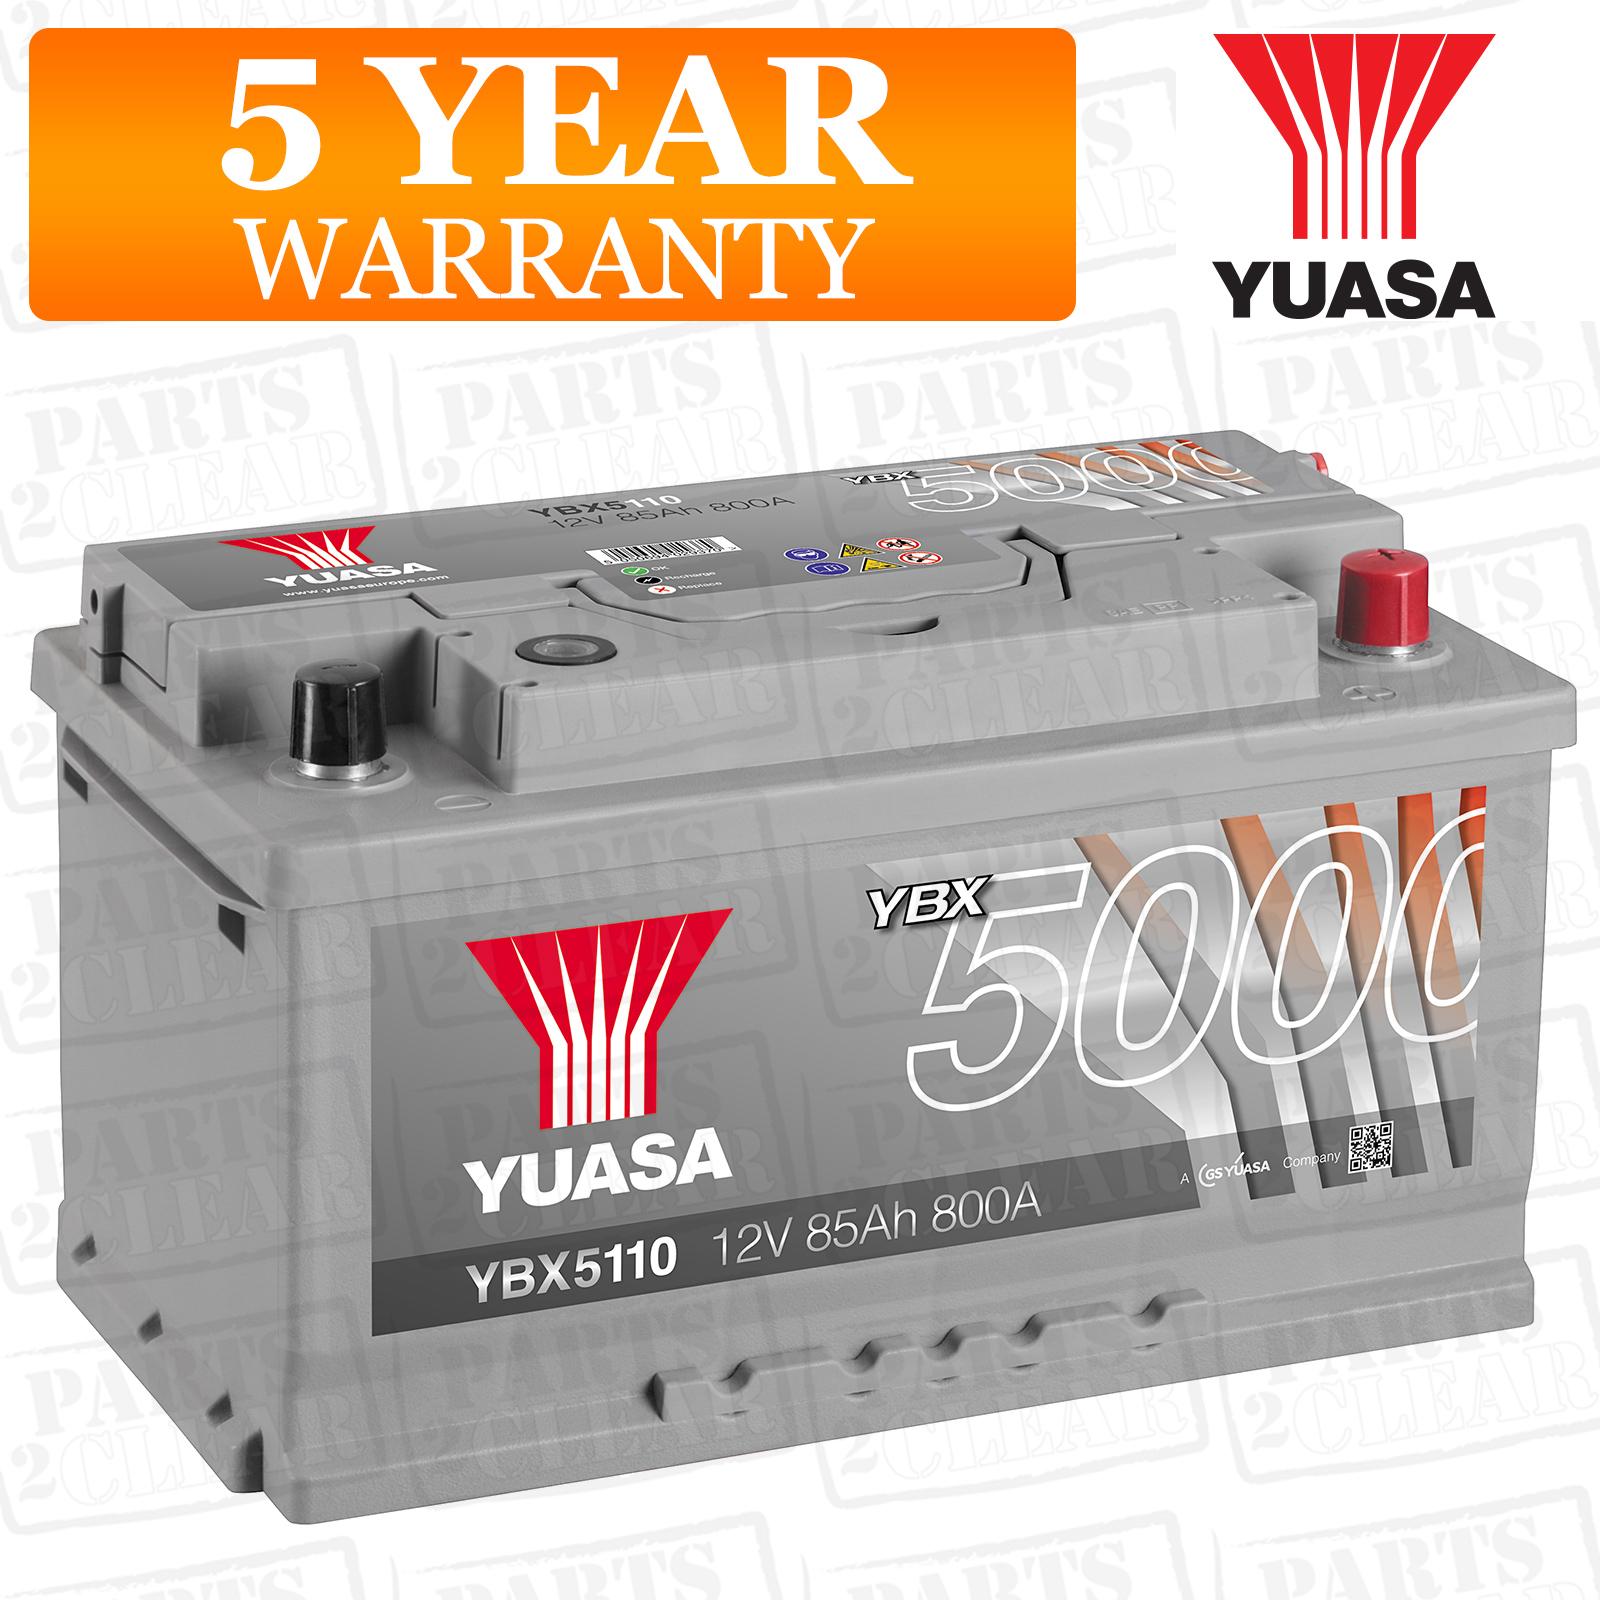 yuasa car battery calcium 12v 800cca 85ah t1 for renault. Black Bedroom Furniture Sets. Home Design Ideas